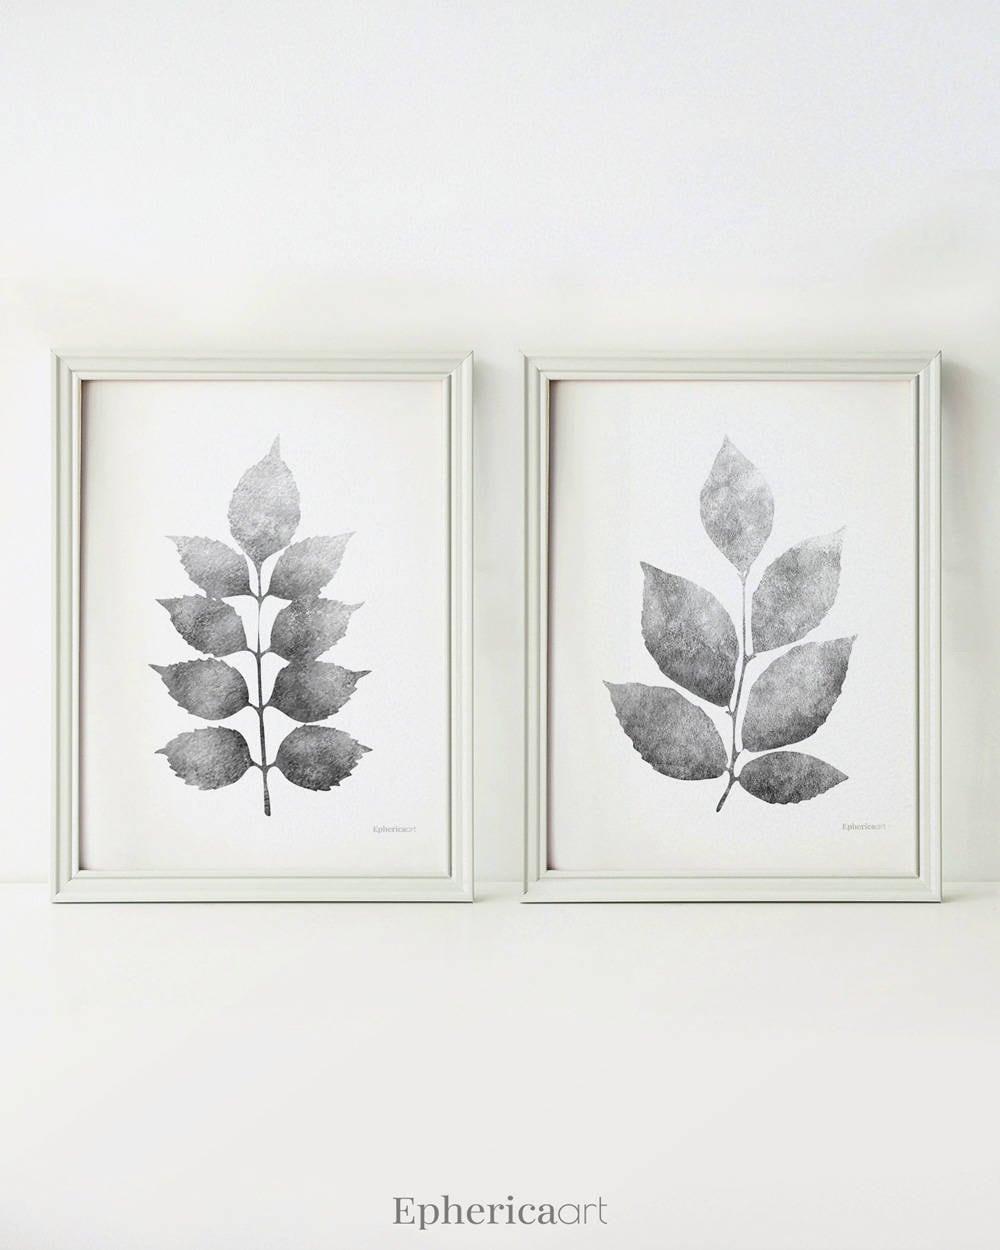 Black And White Kitchen Artwork: Leaves Art Black And White Prints Kitchen Wall Art Grey